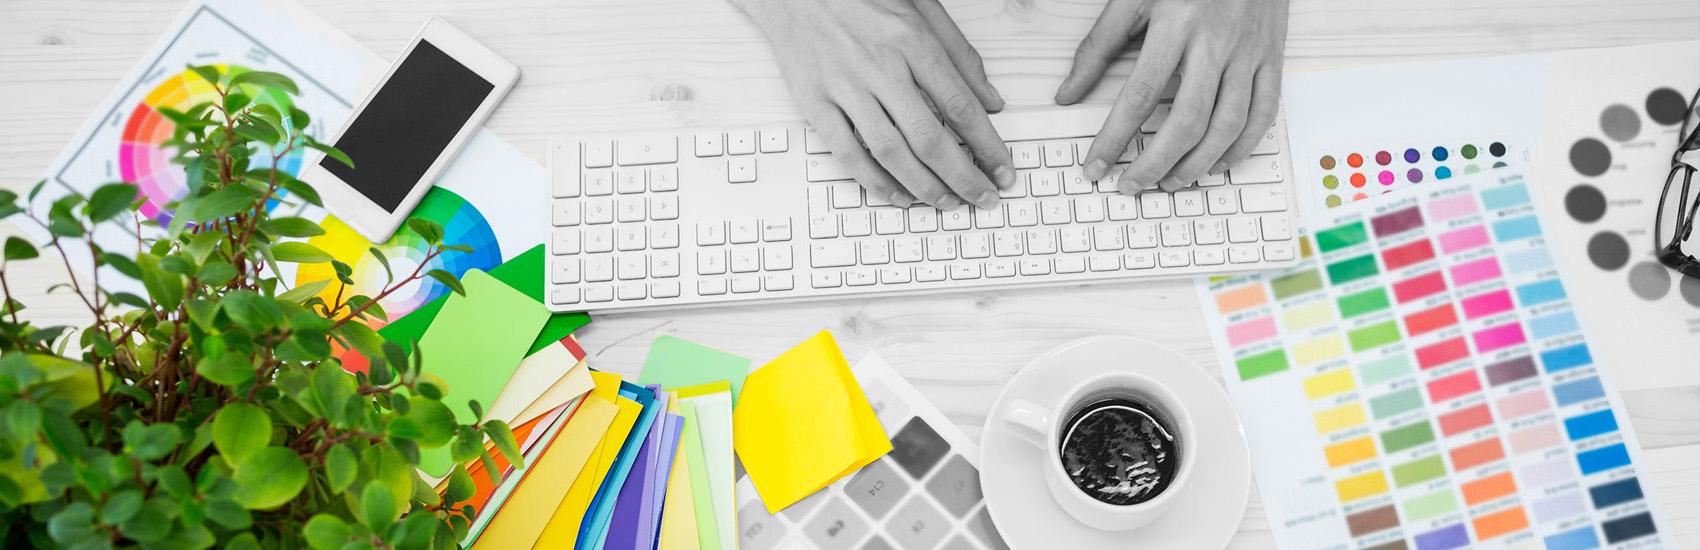 Как цвета в маркетинге влияют на эмоции или психология цвета в маркетинге в действии